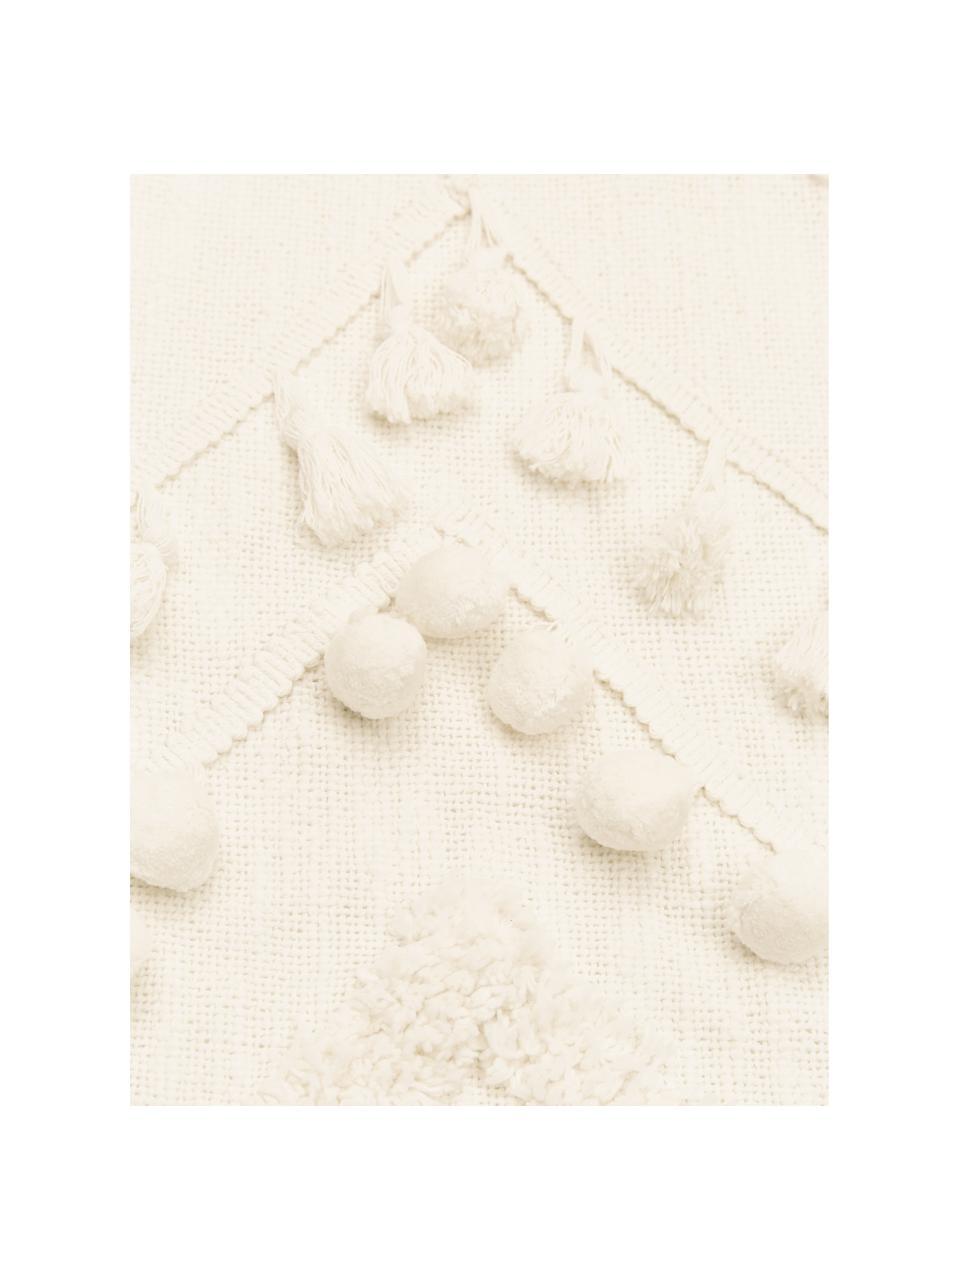 Boho katoenen plaid Pana met kwastjes en pompoms, 100% katoen, Crèmewit, 130 x 170 cm